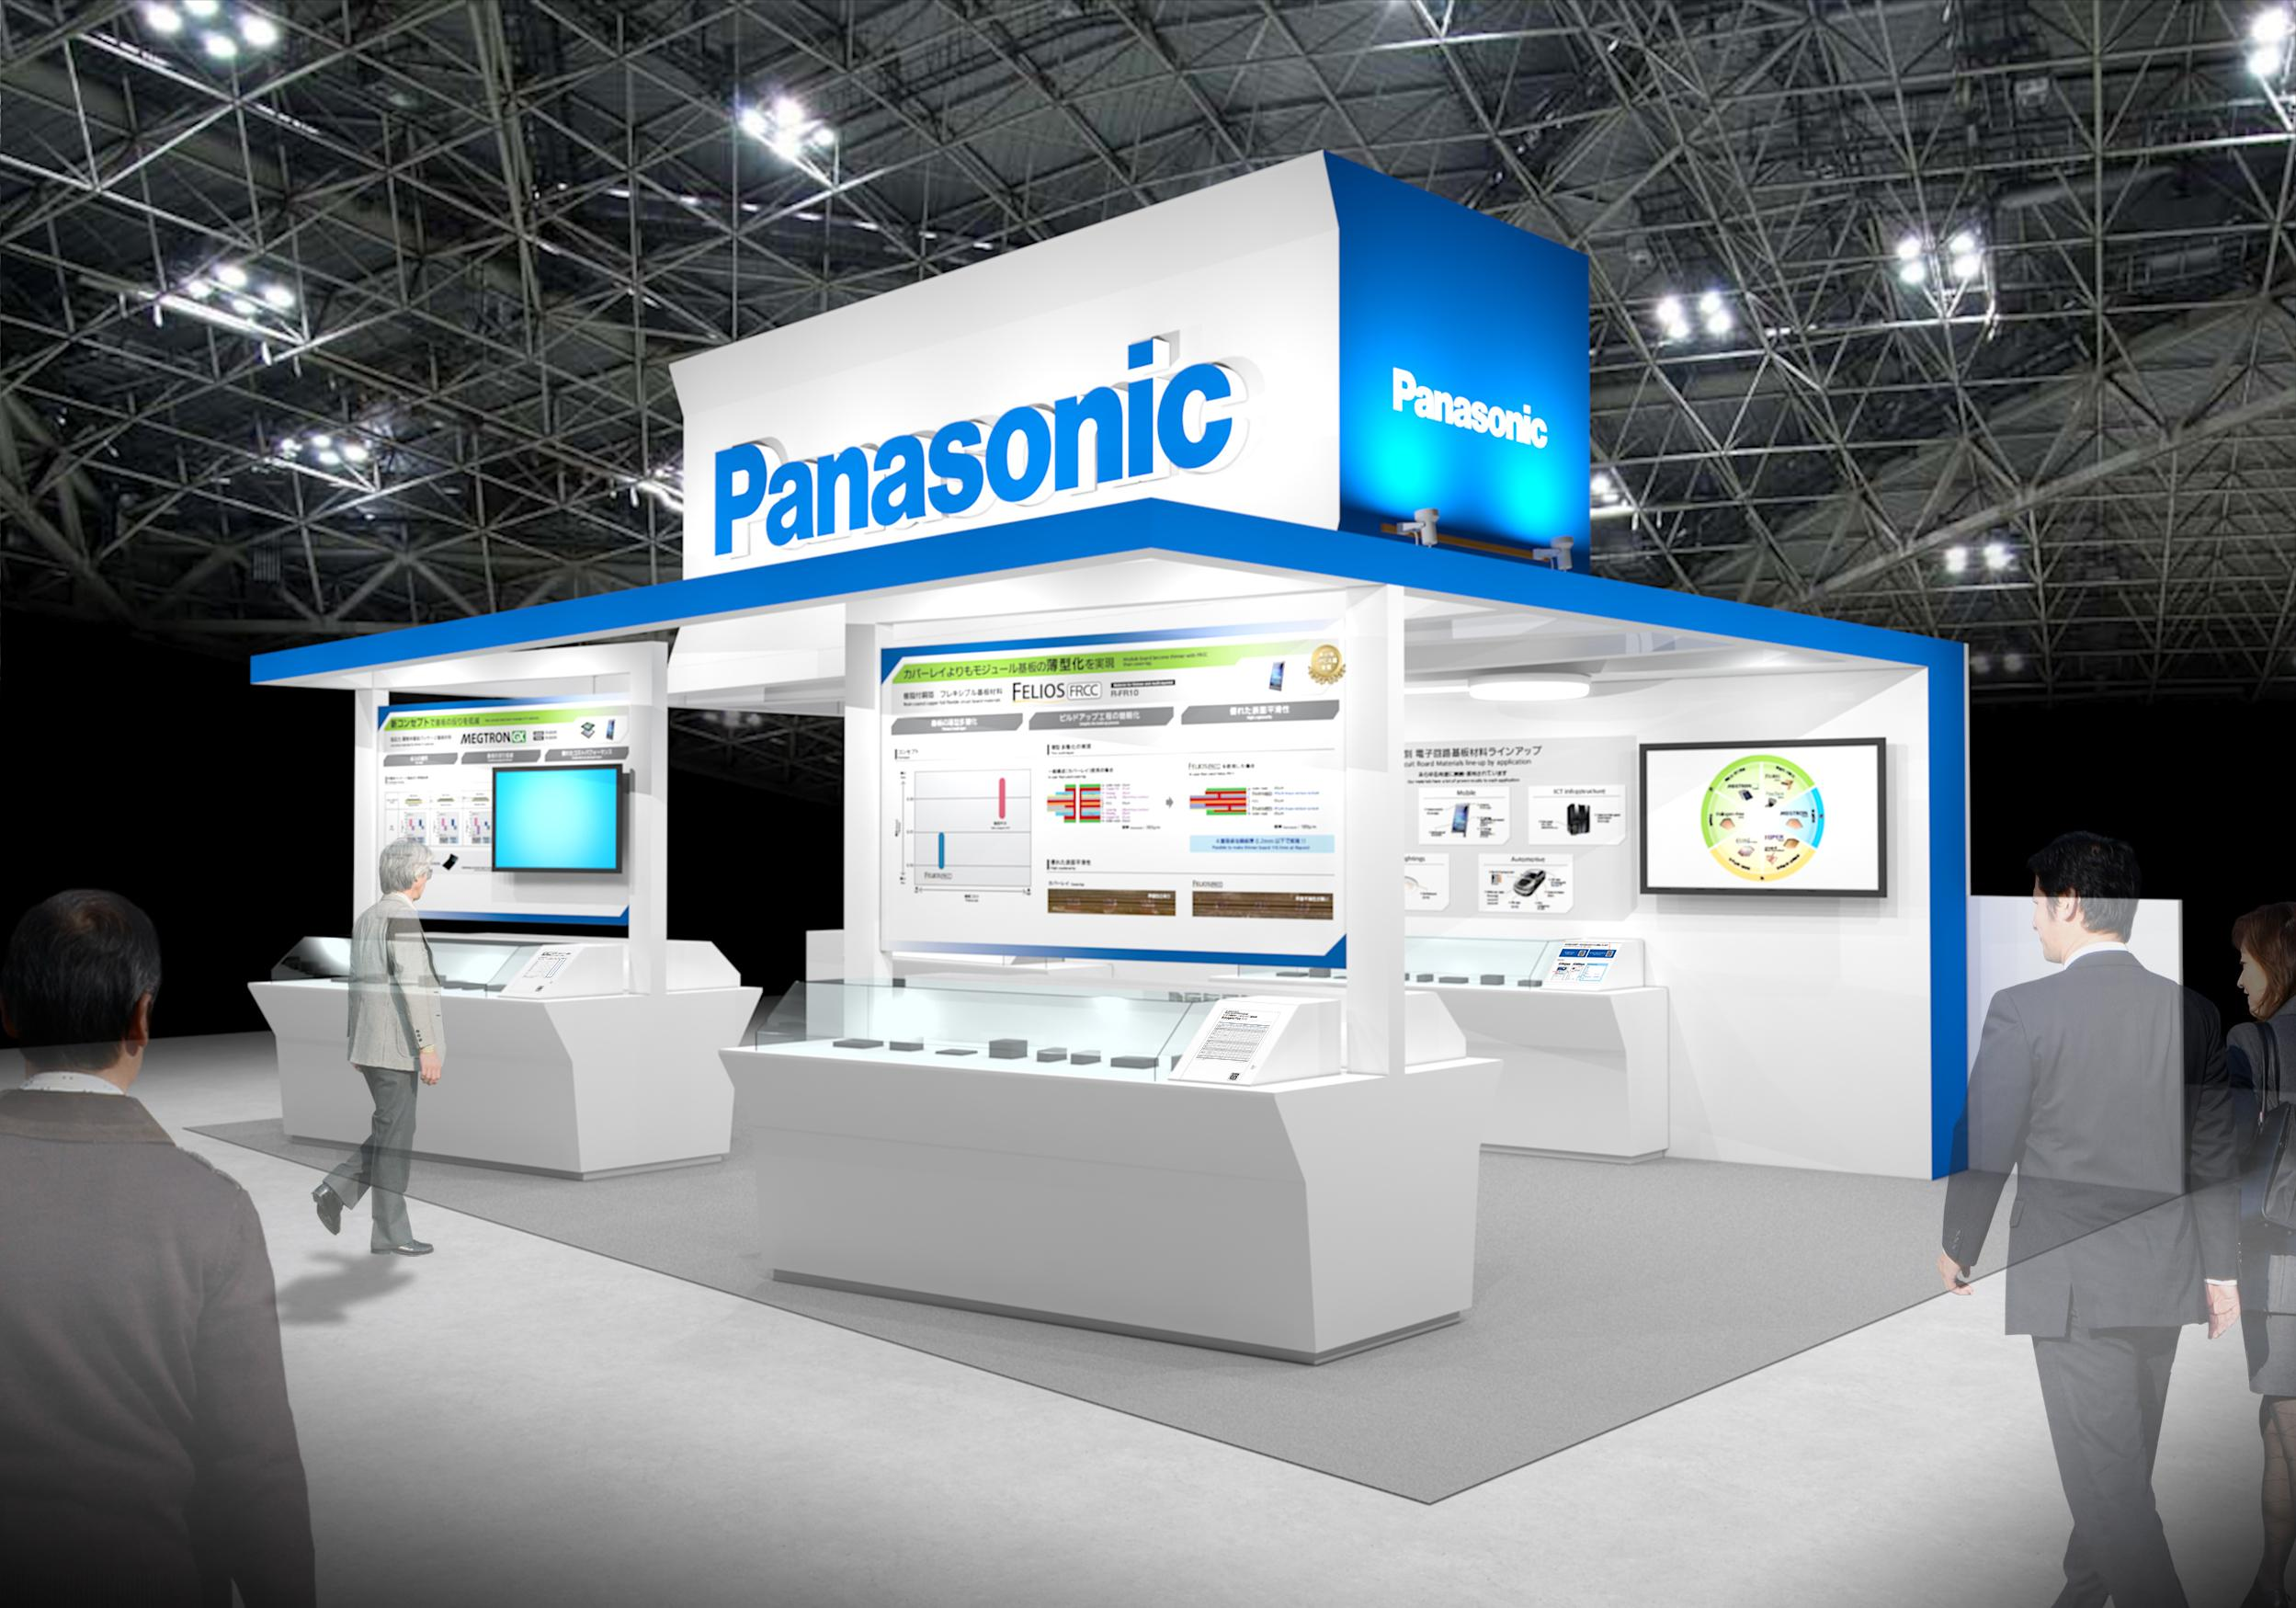 「JPCA Show 2016(第46回 国際電子回路産業展)」パナソニックブース イメージ